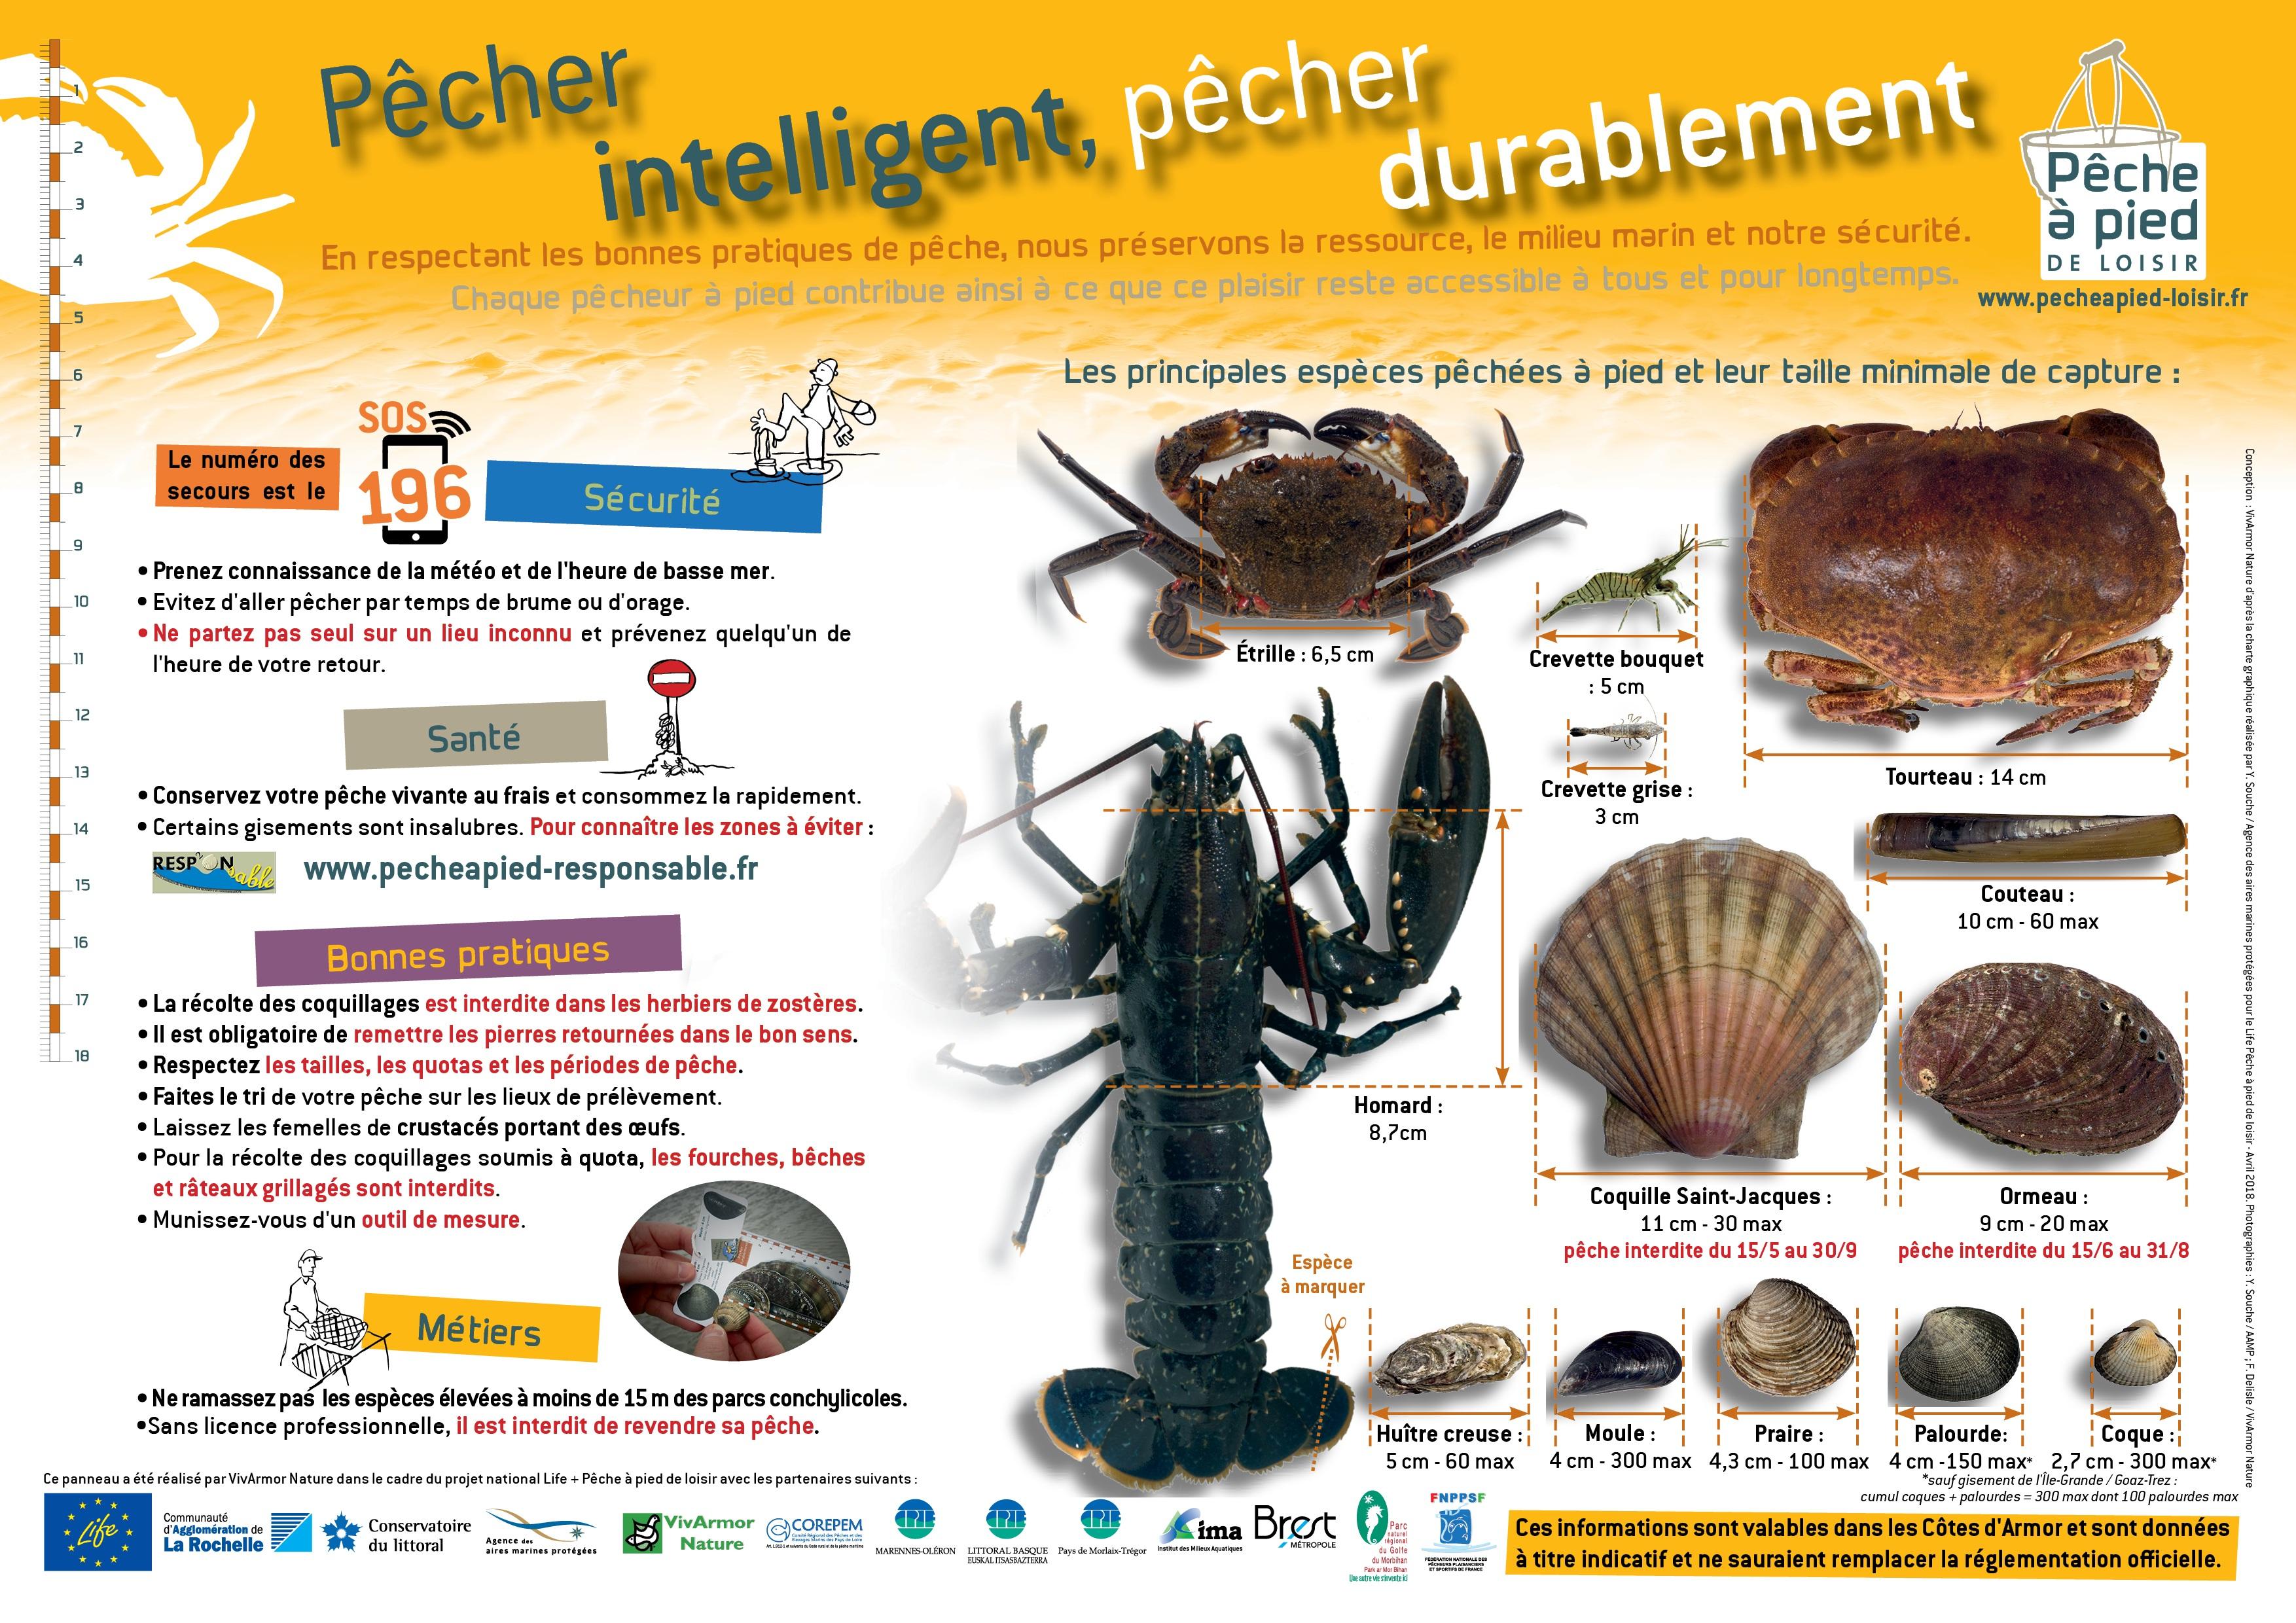 Calendrier Des Marees La Rochelle 2020.Les Grandes Marees En Cotes D Armor